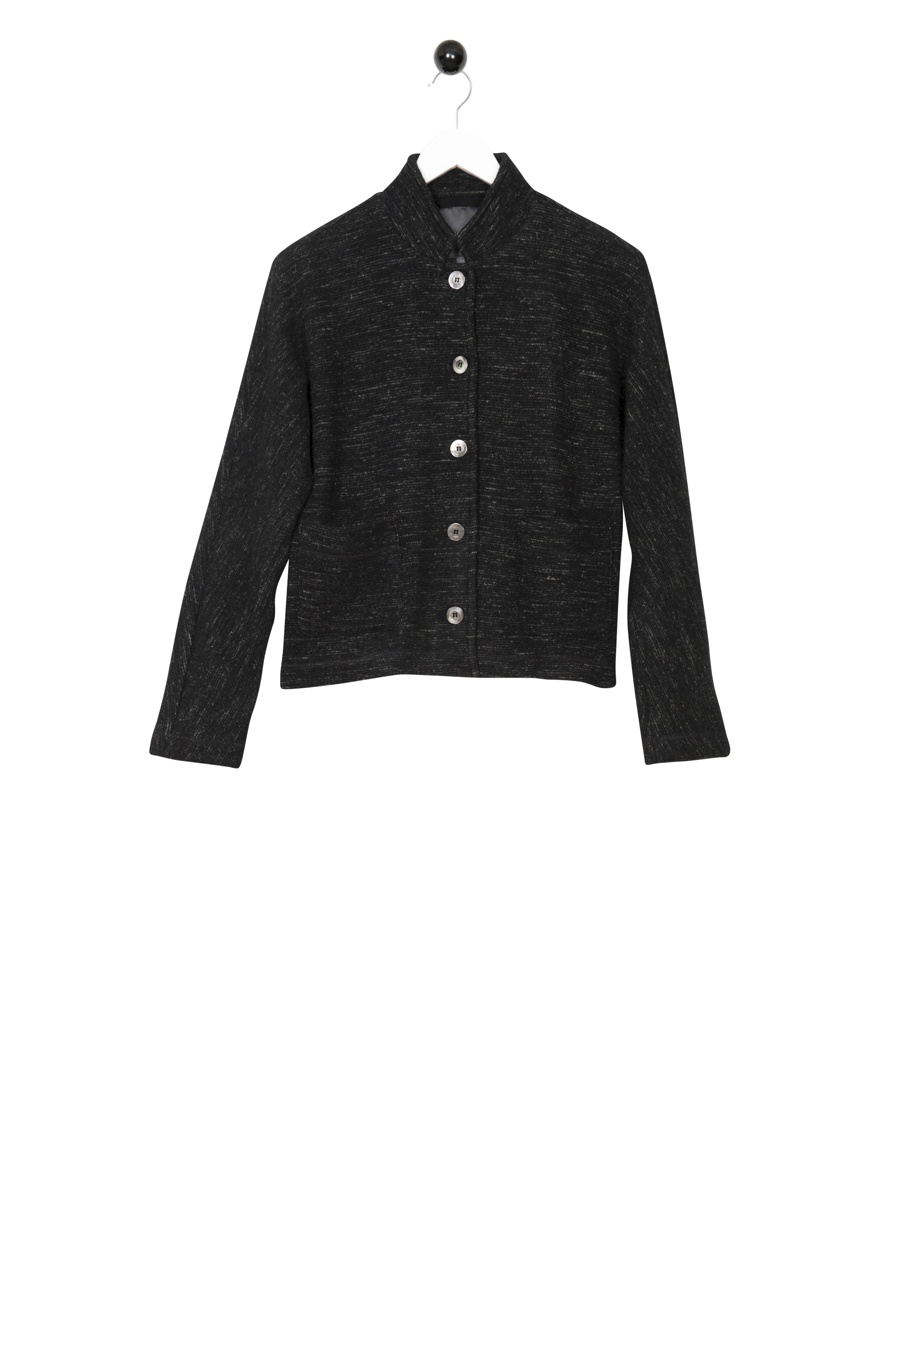 Rosmarin Jacket